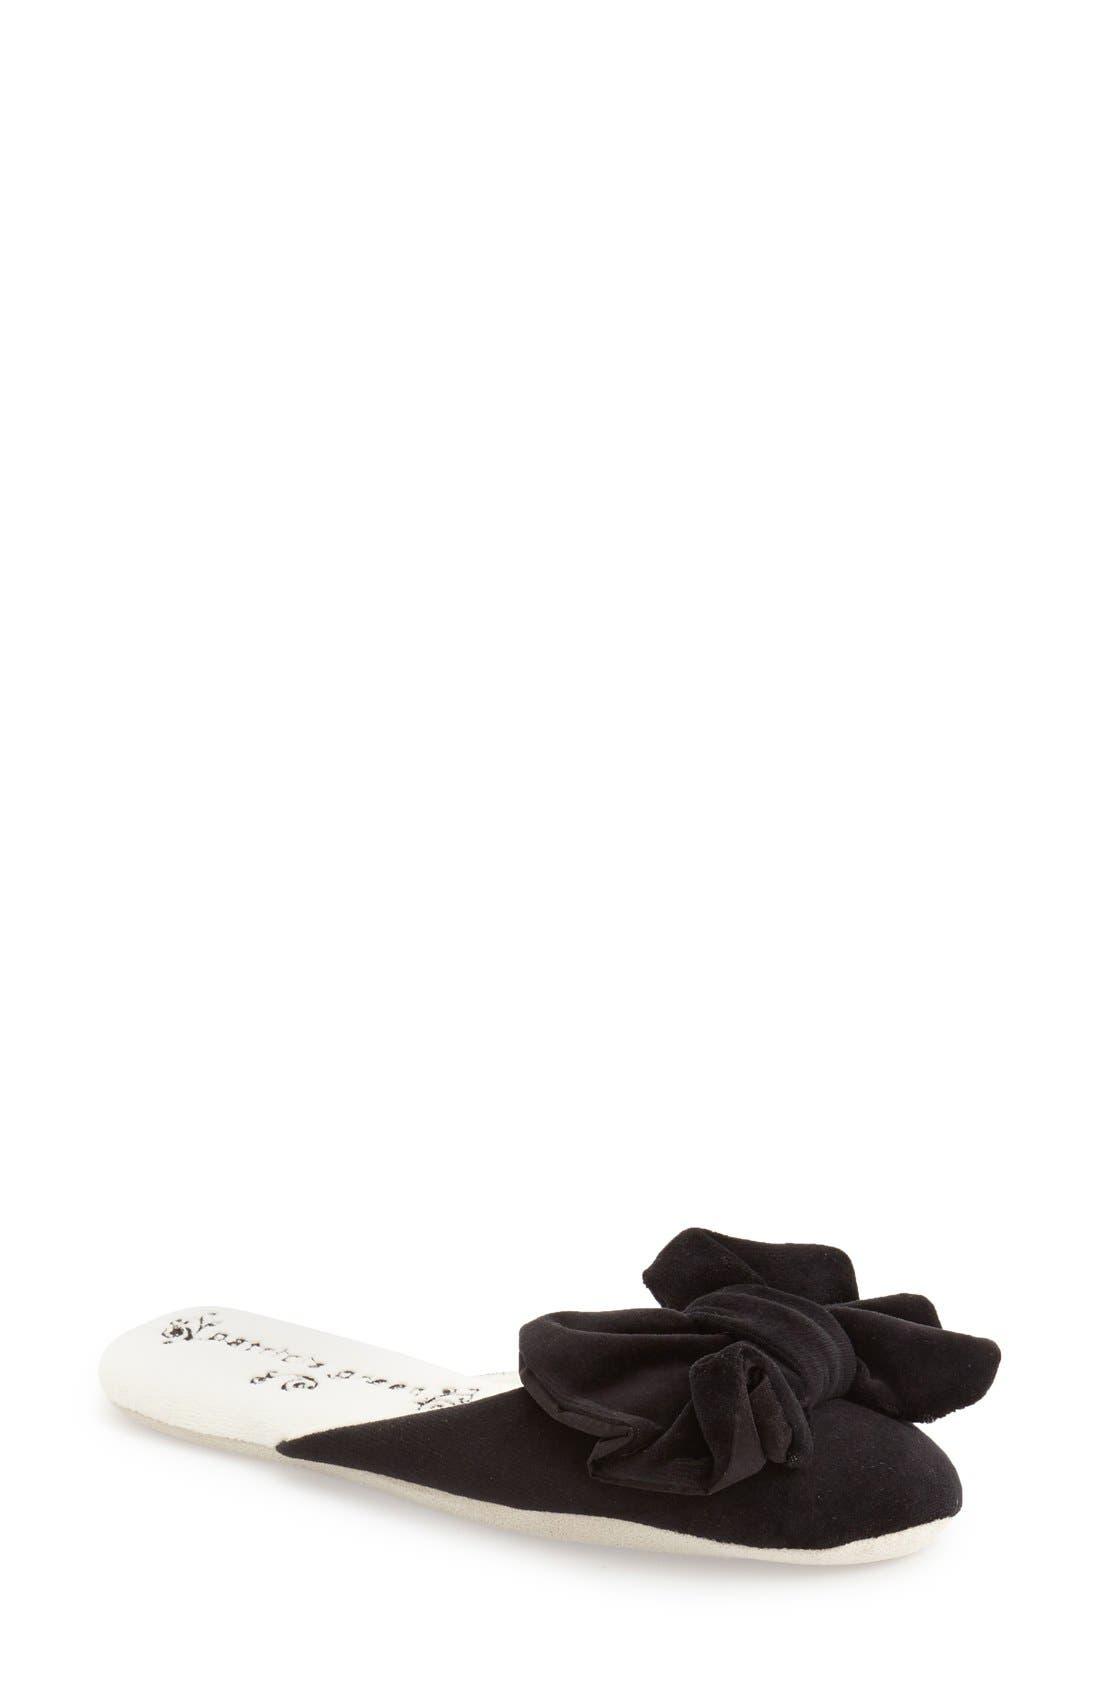 'Betty' Slipper,                         Main,                         color, Black Polyester